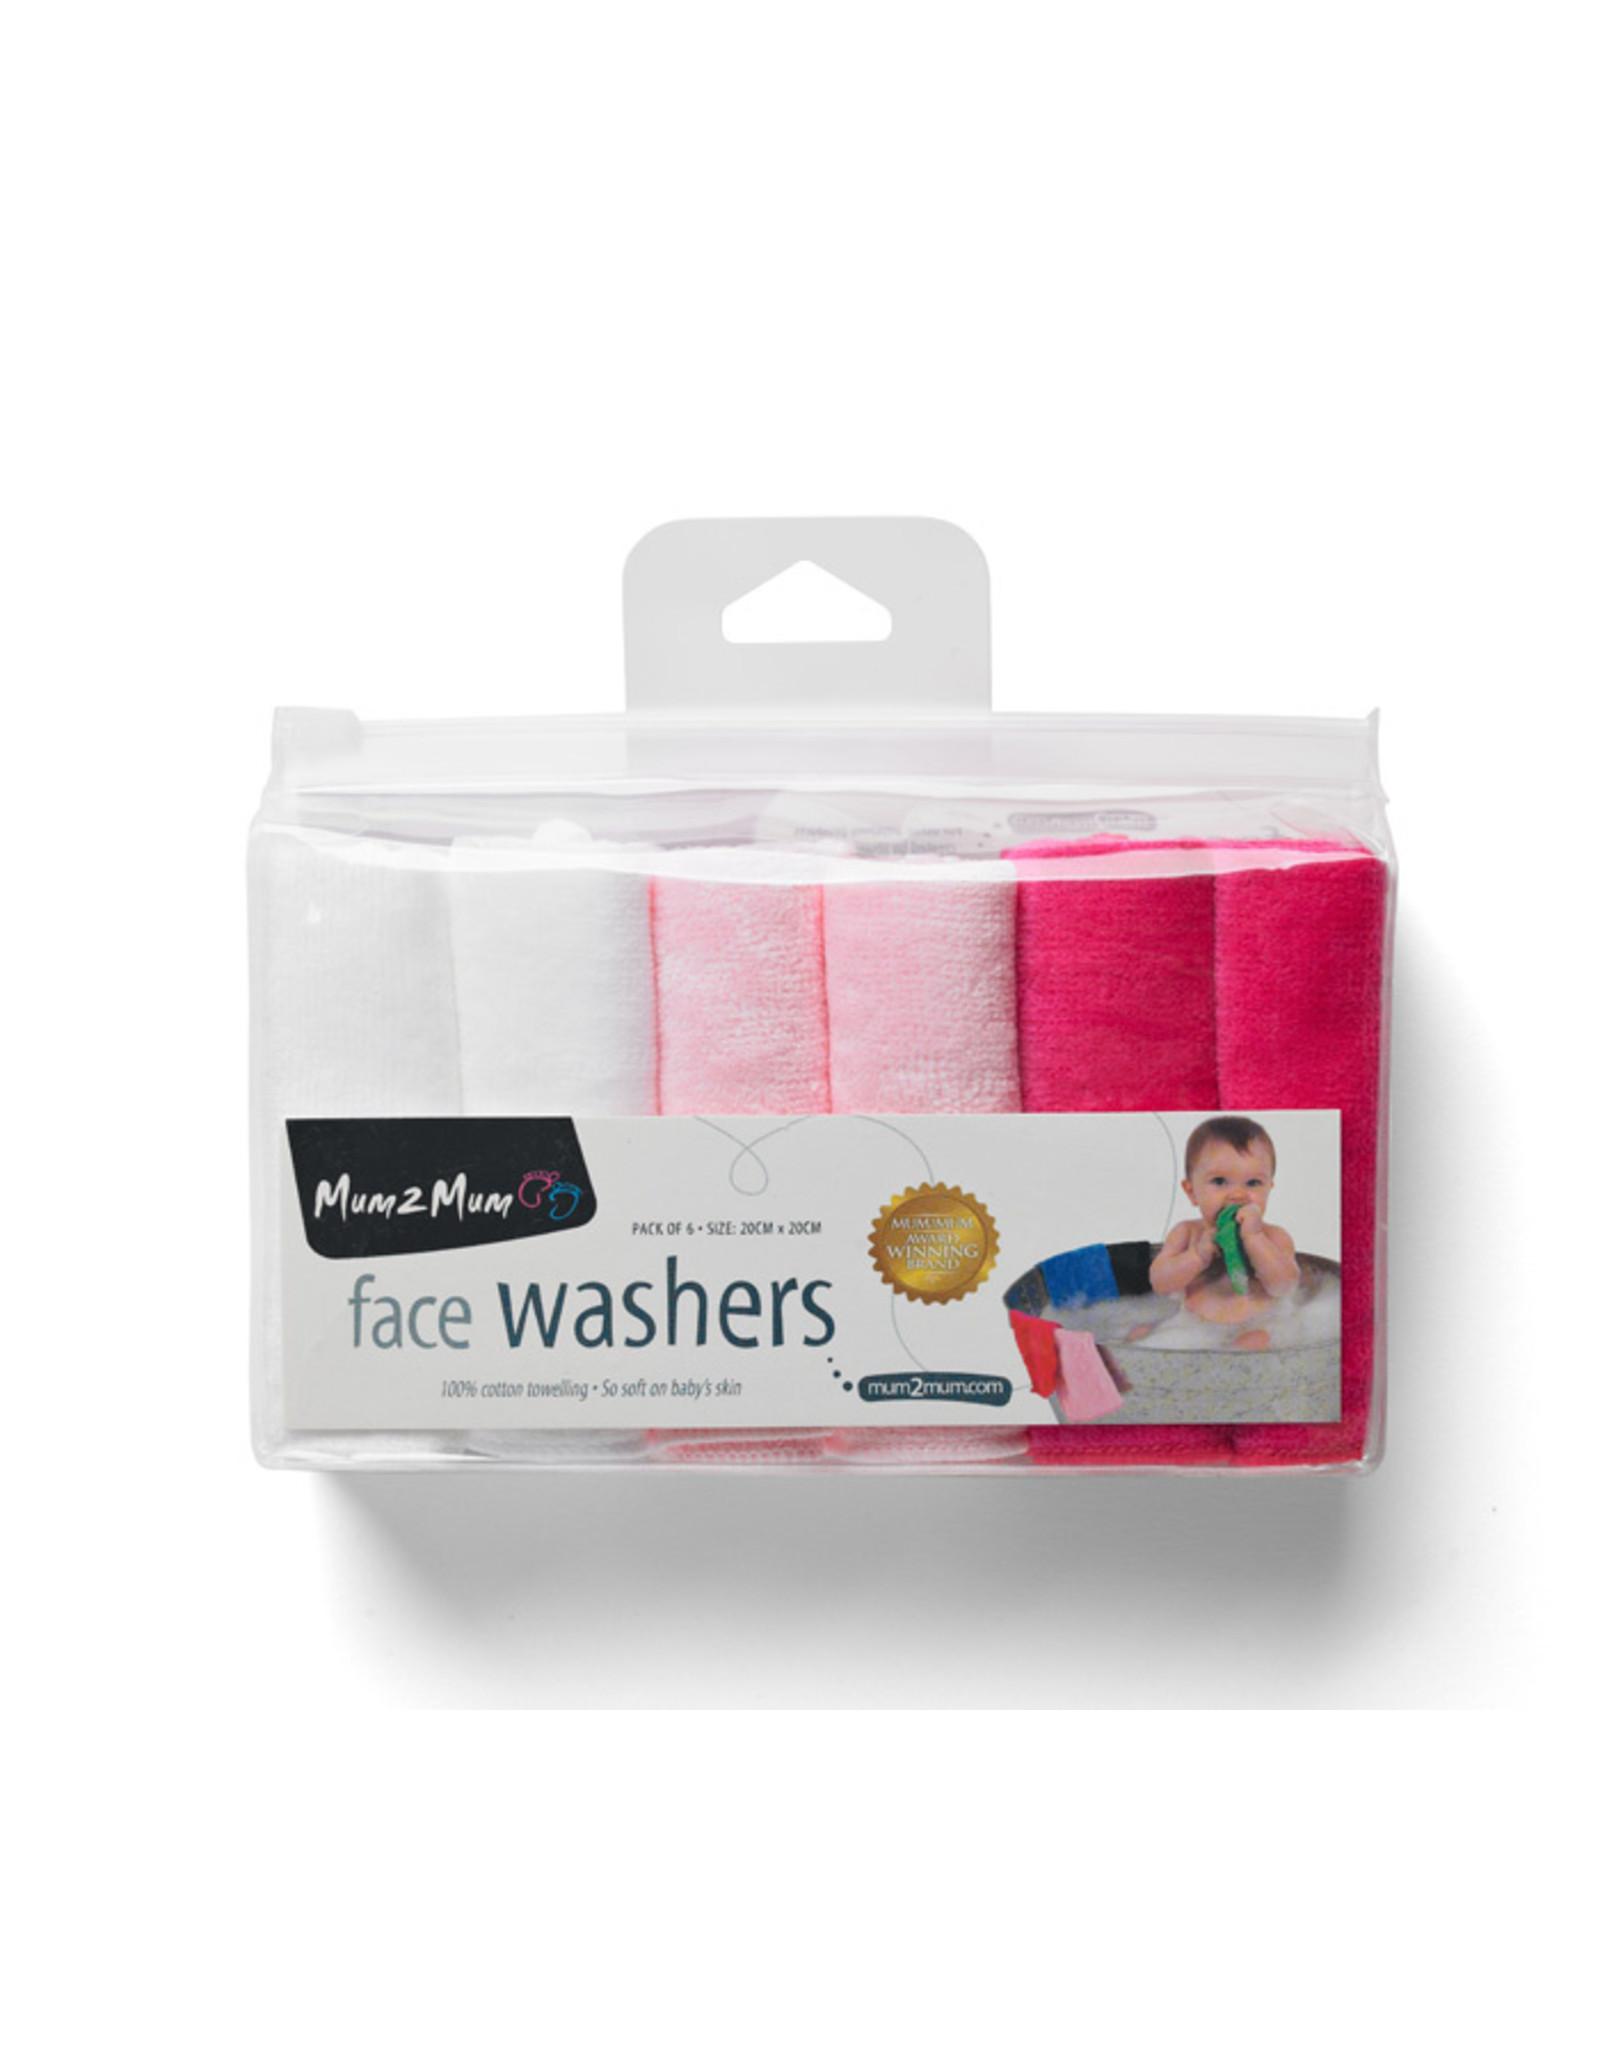 Mum2Mum Face Washers  Girl Mix 6 stuks in een verpakking